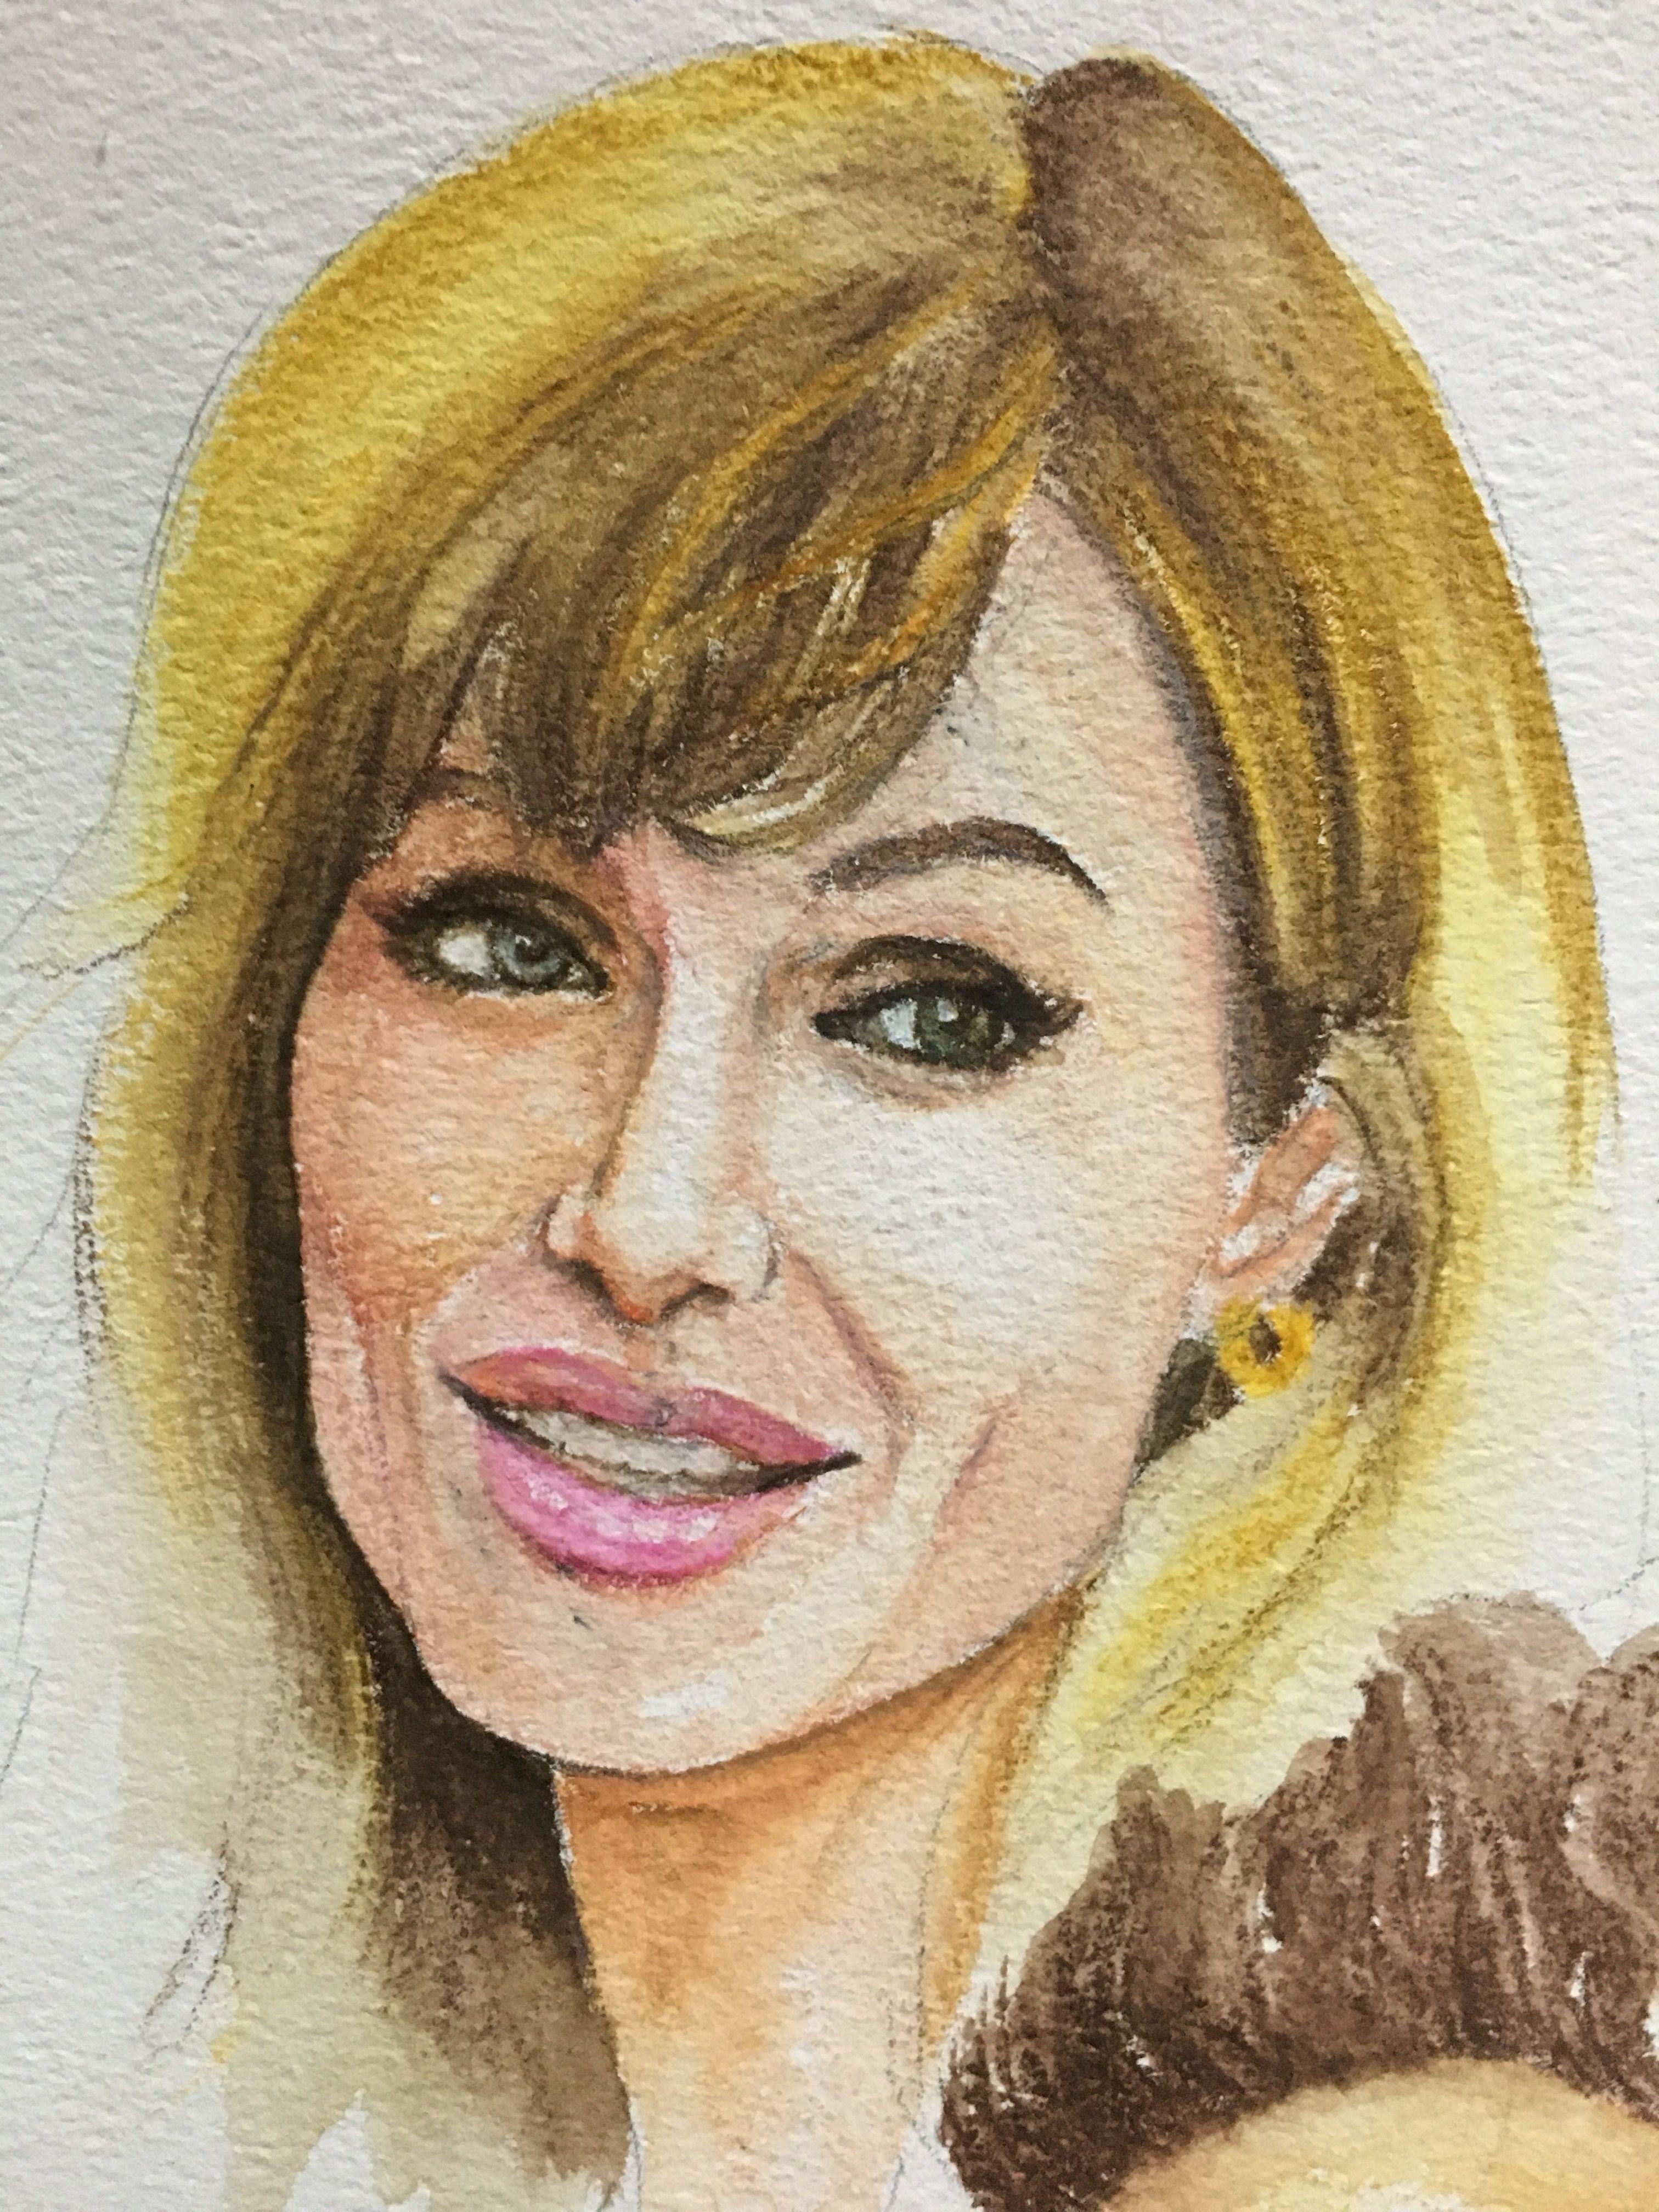 Angelina jolie watercolor pencil portrait paintings in 2019